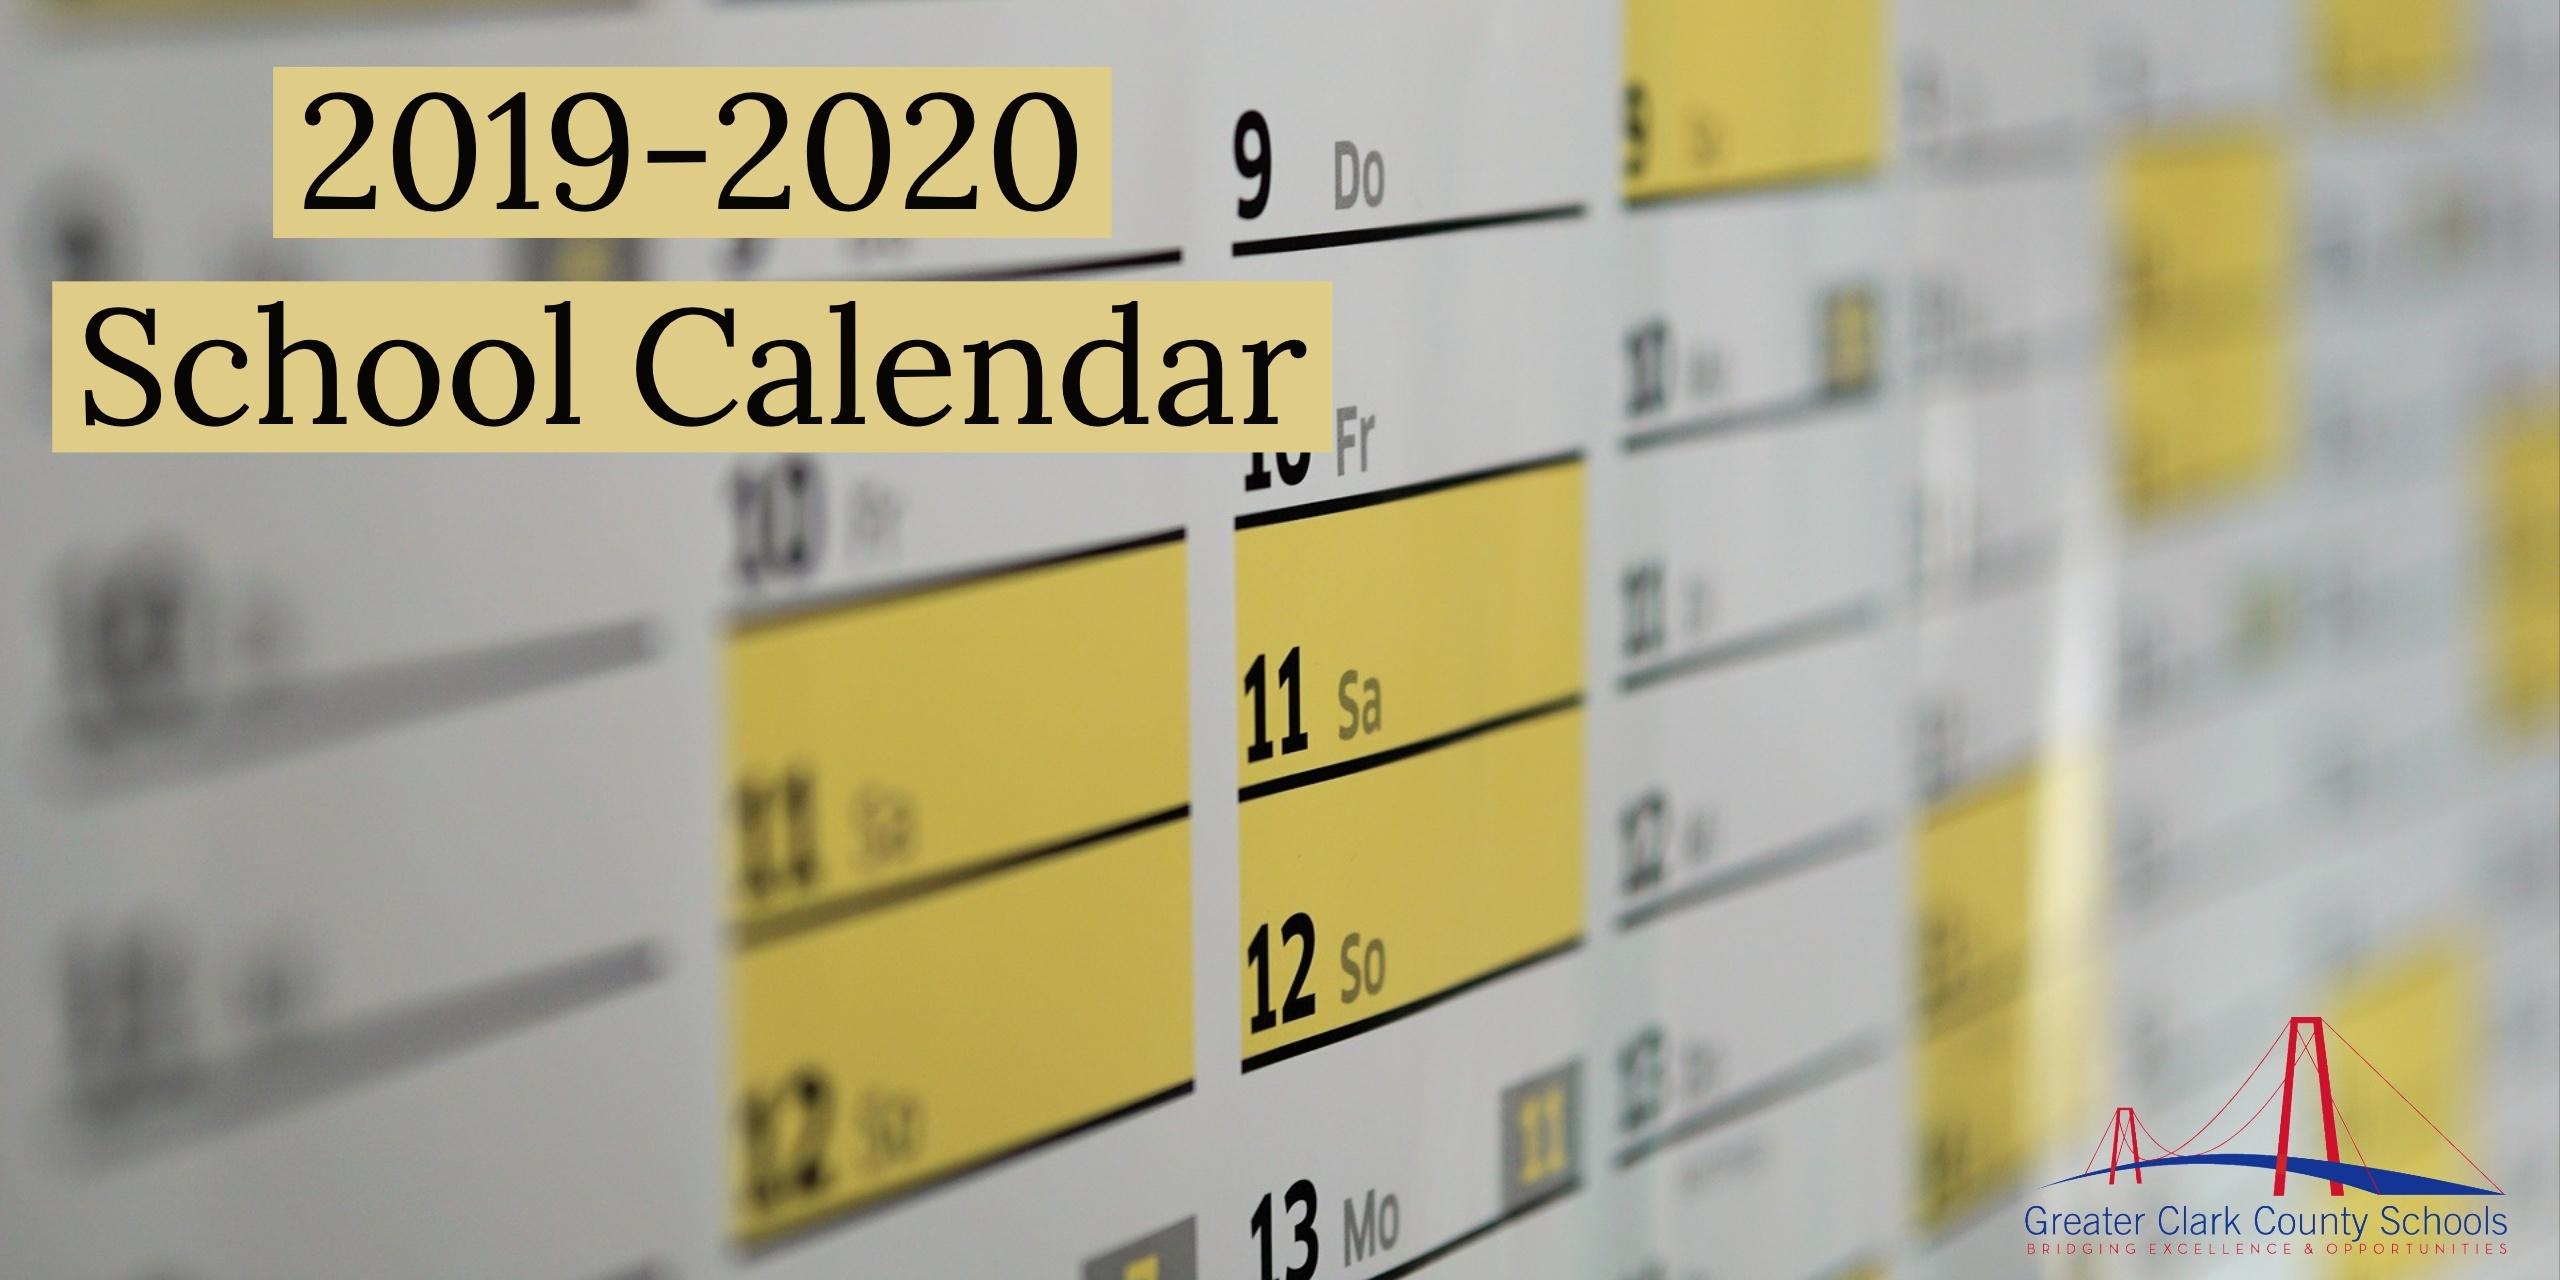 2019-2020 School Calendar – Greater Clark County Schools_School Calendar Osceola County 2020